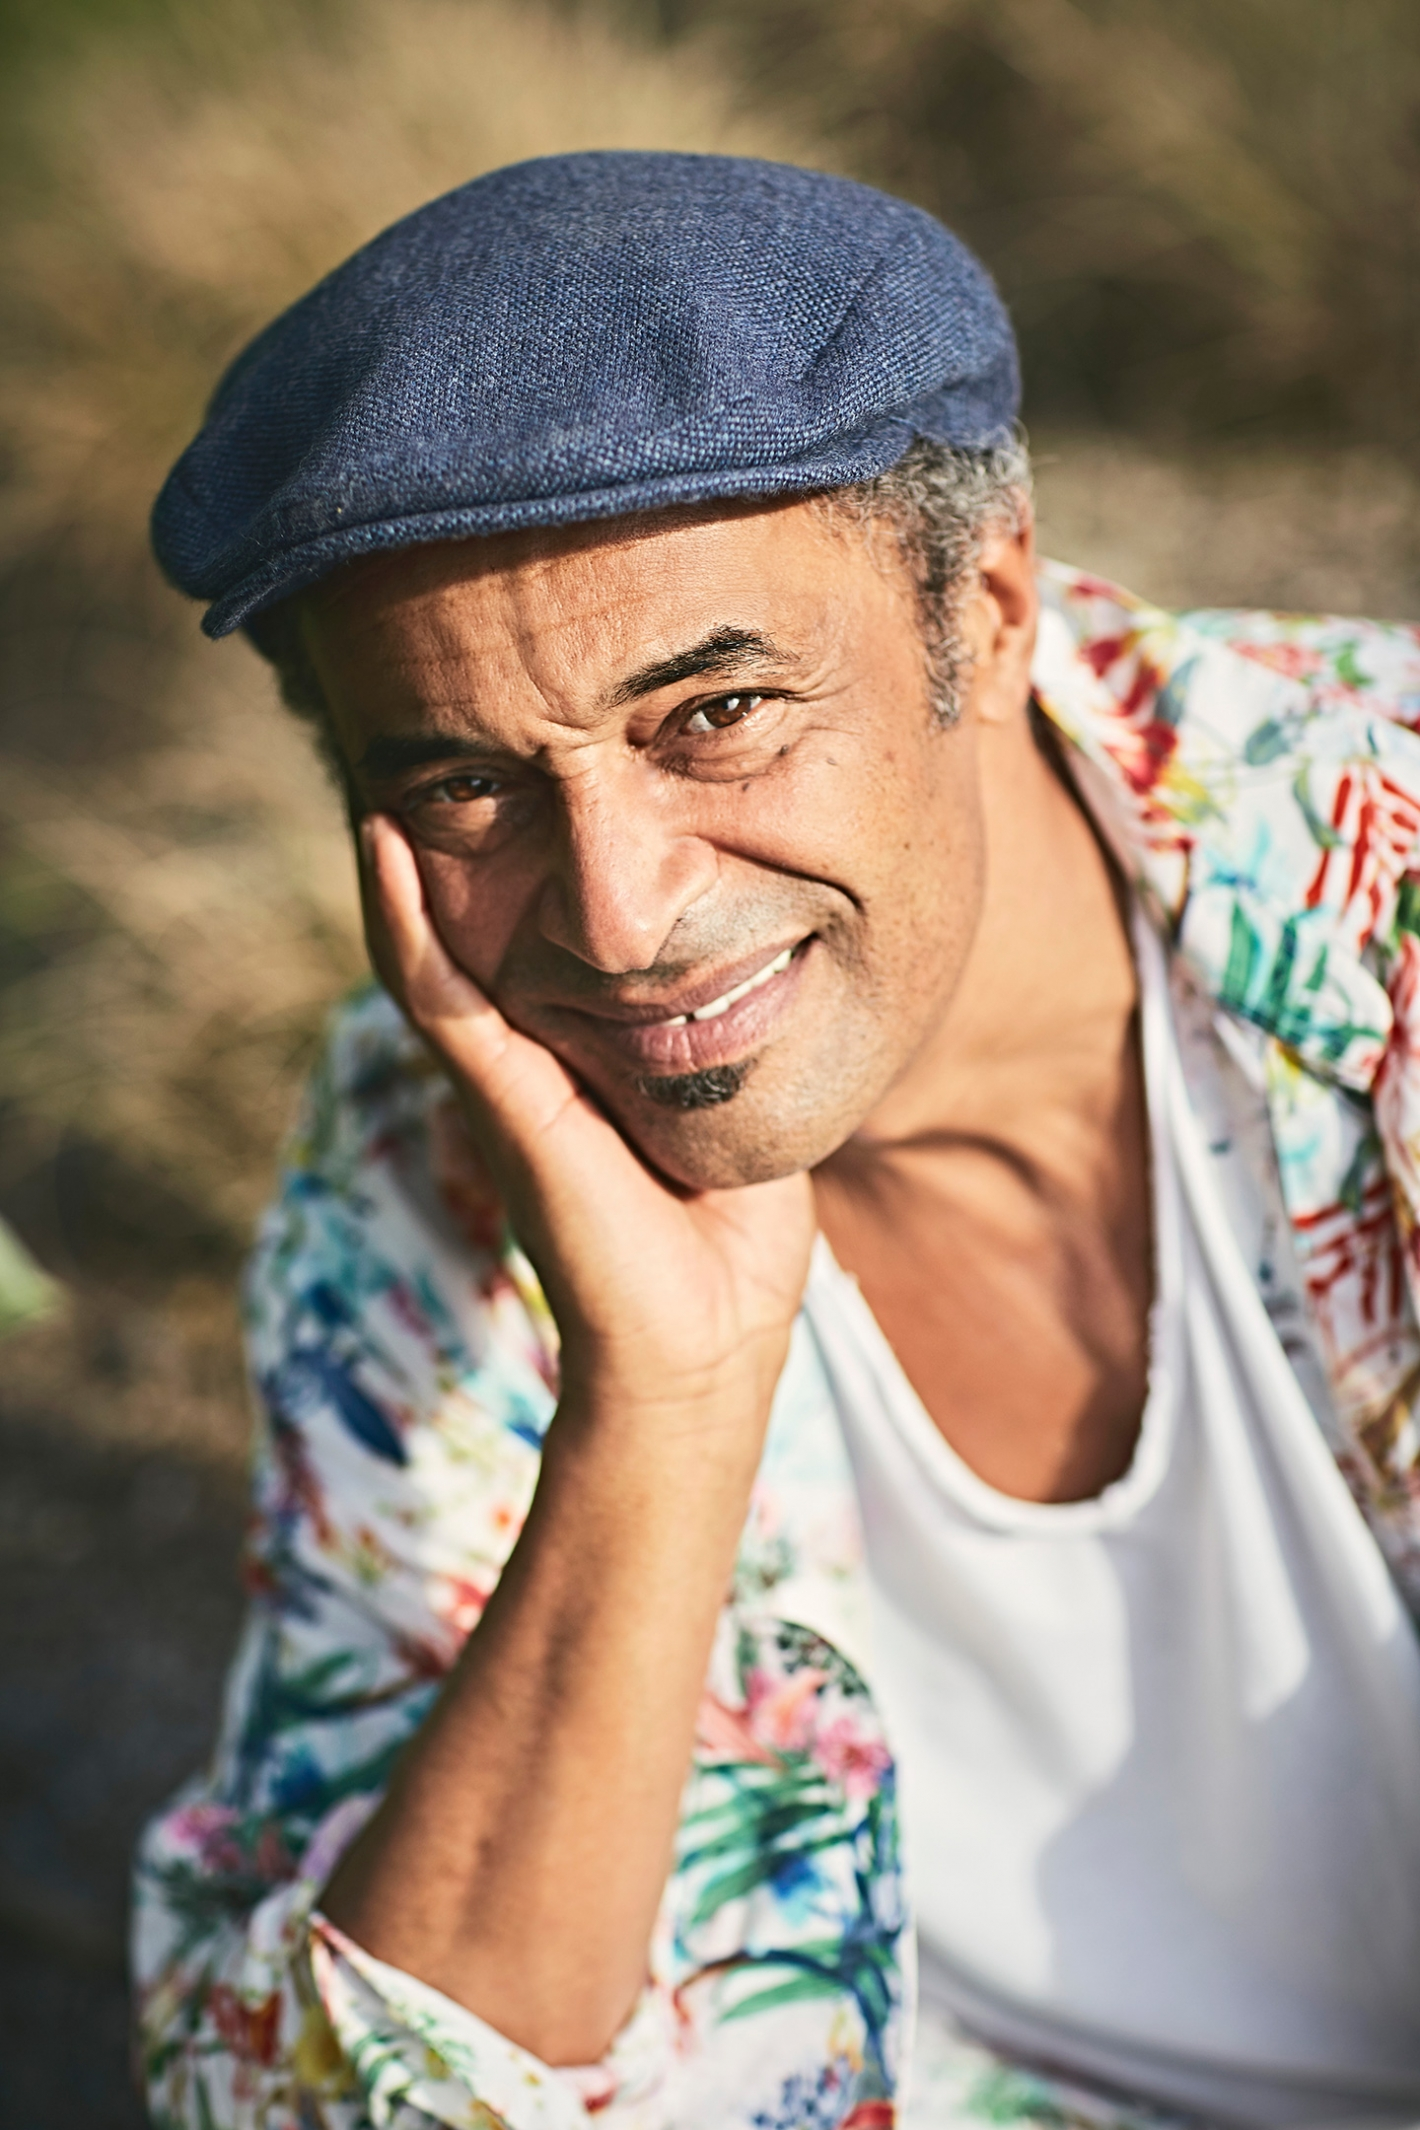 Portraits-Yannick-Noah-HR_3371©Laetizia-Bazzoni